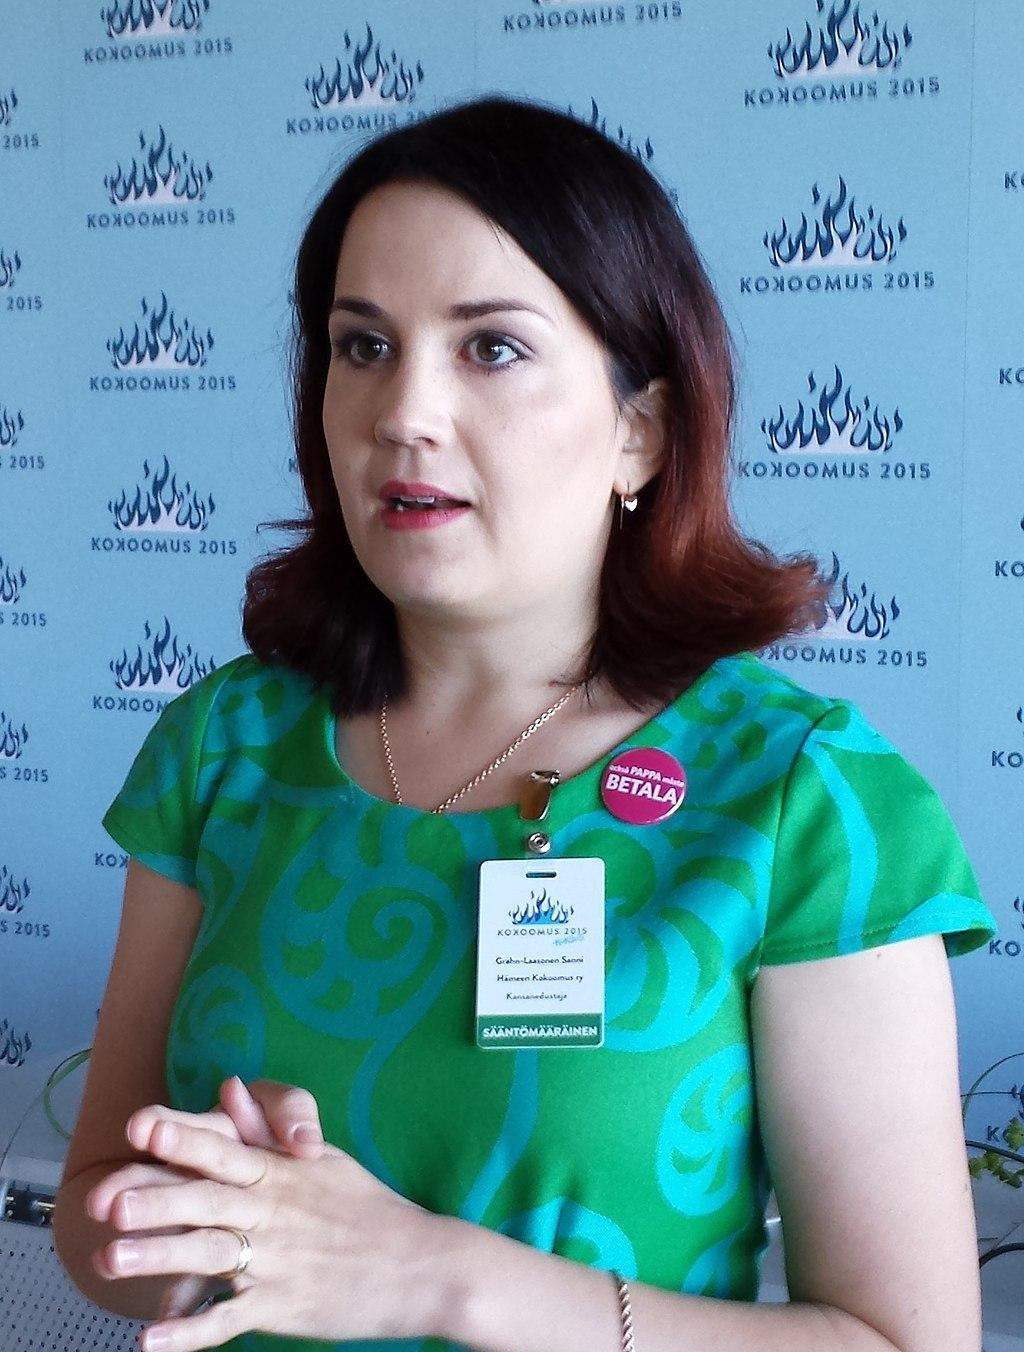 Finlands undervisningsminister Sanni Grahn-Laasonen.